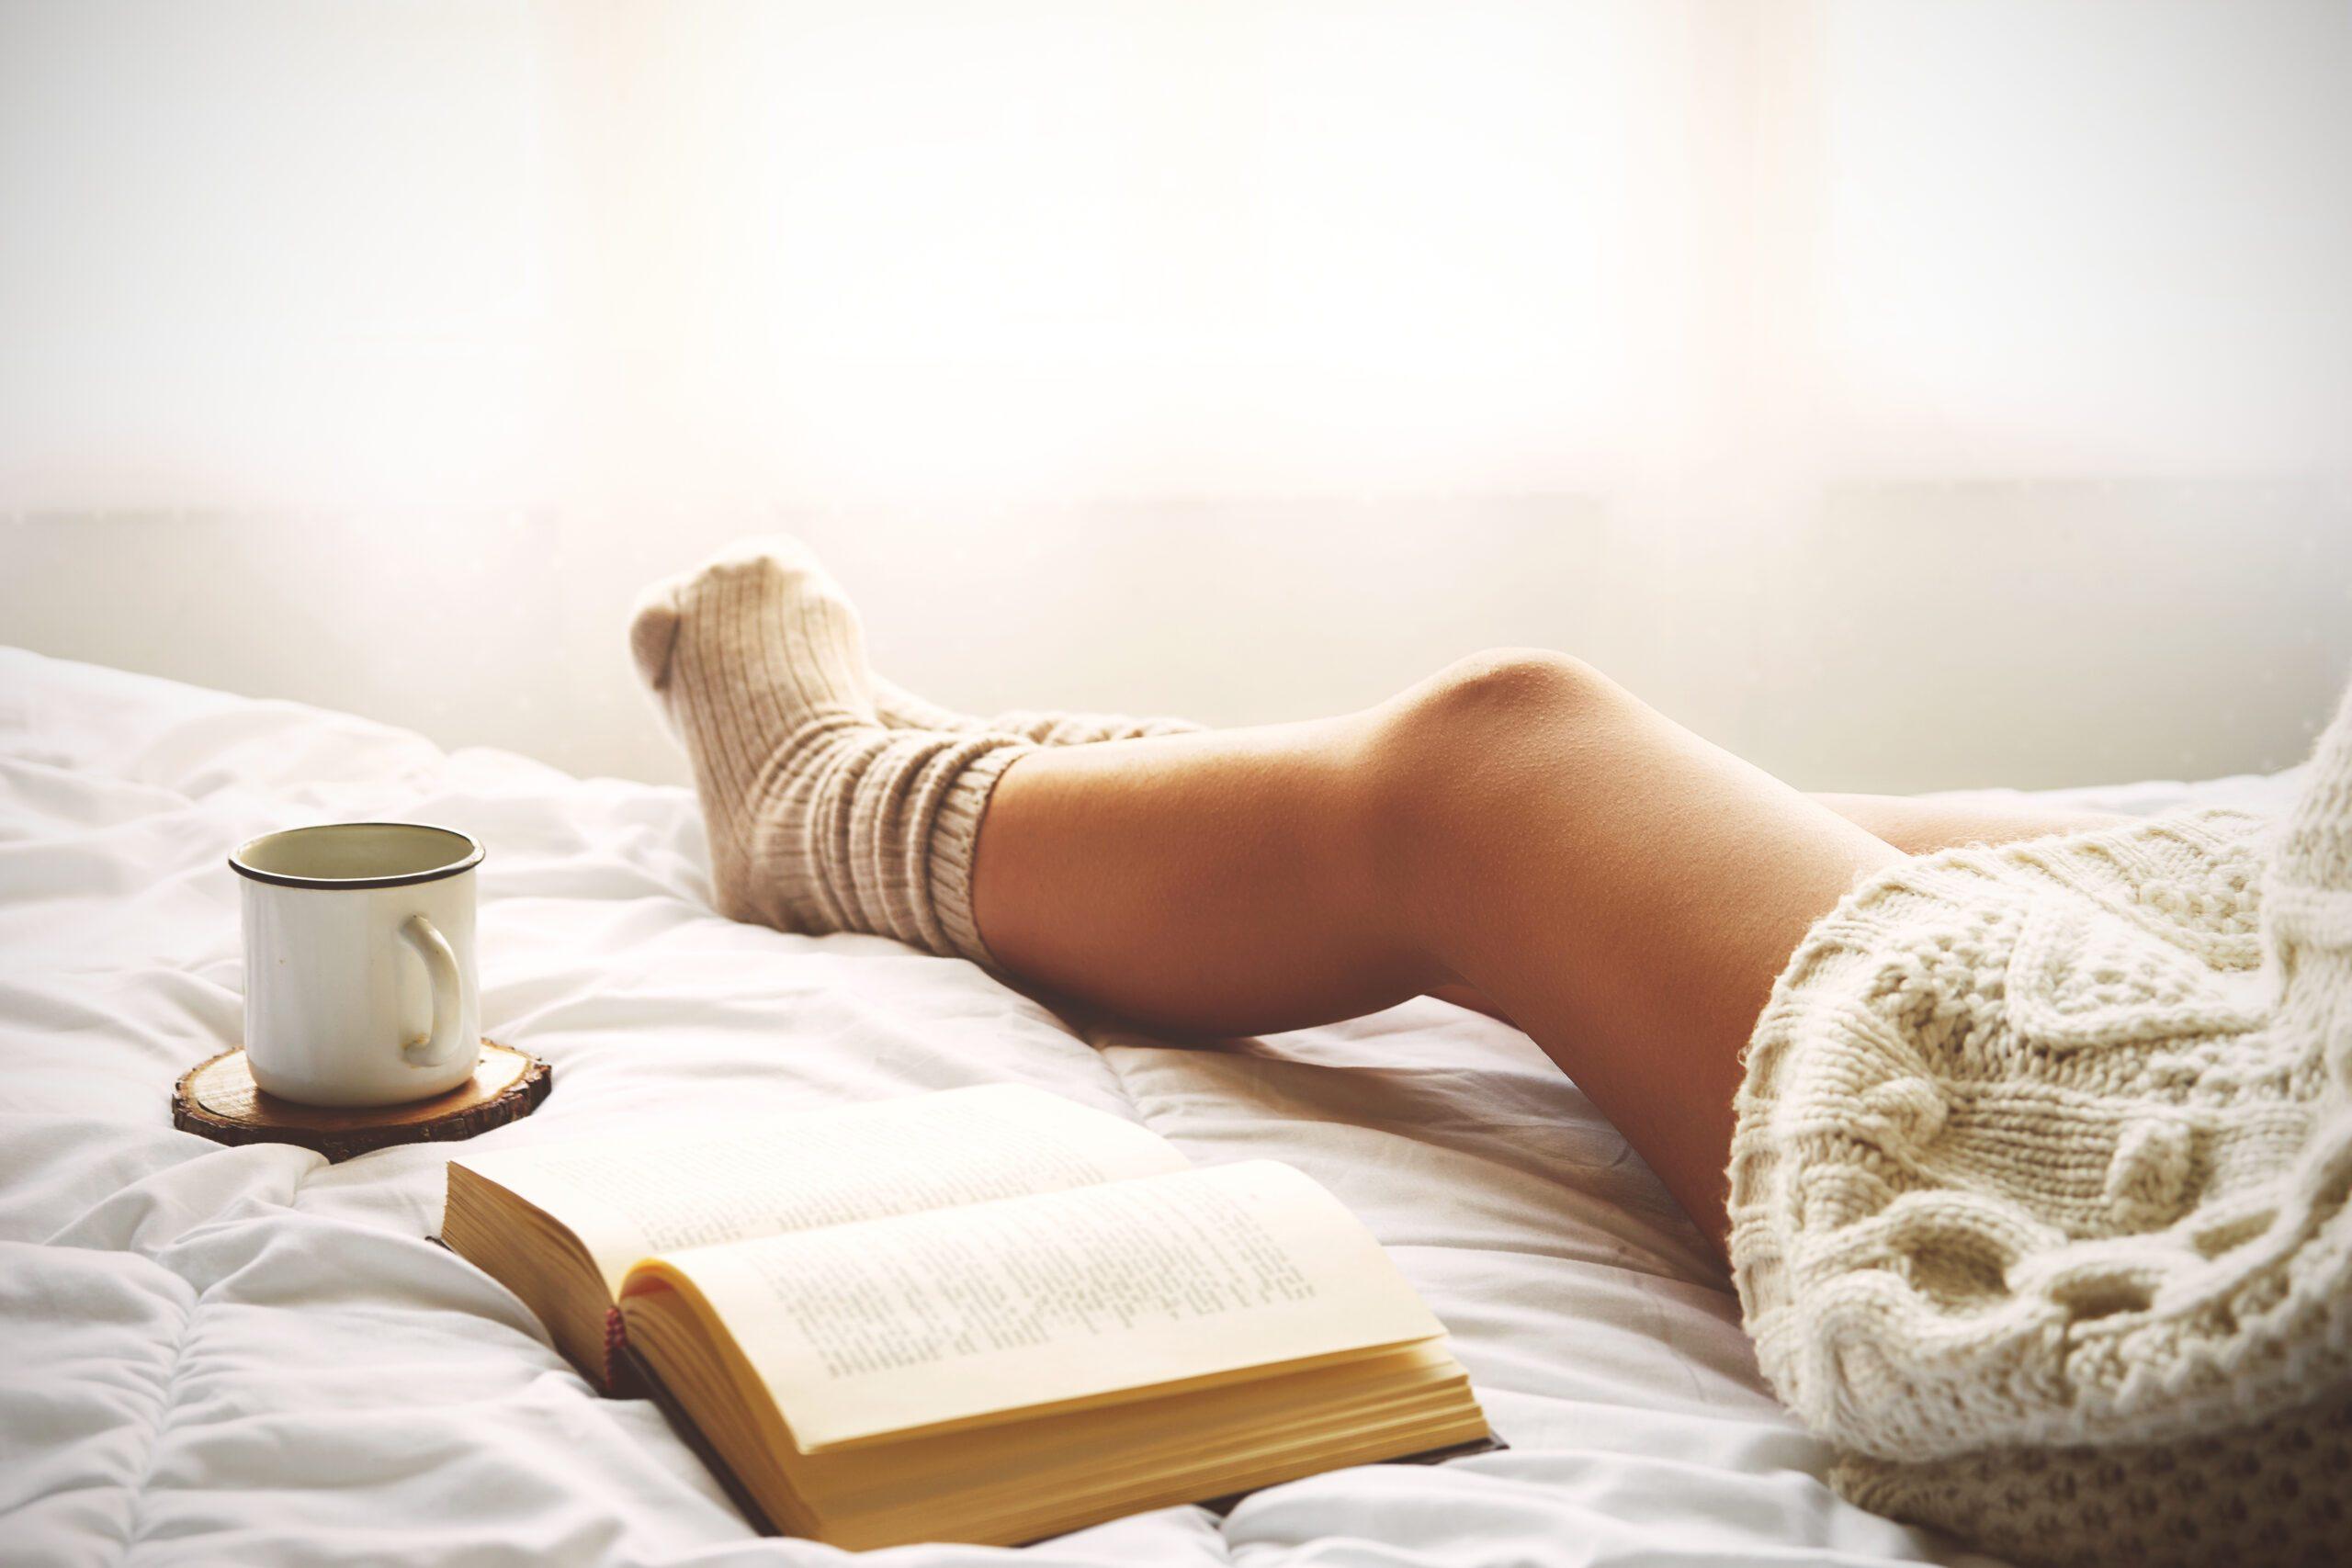 Coffee before sleep?